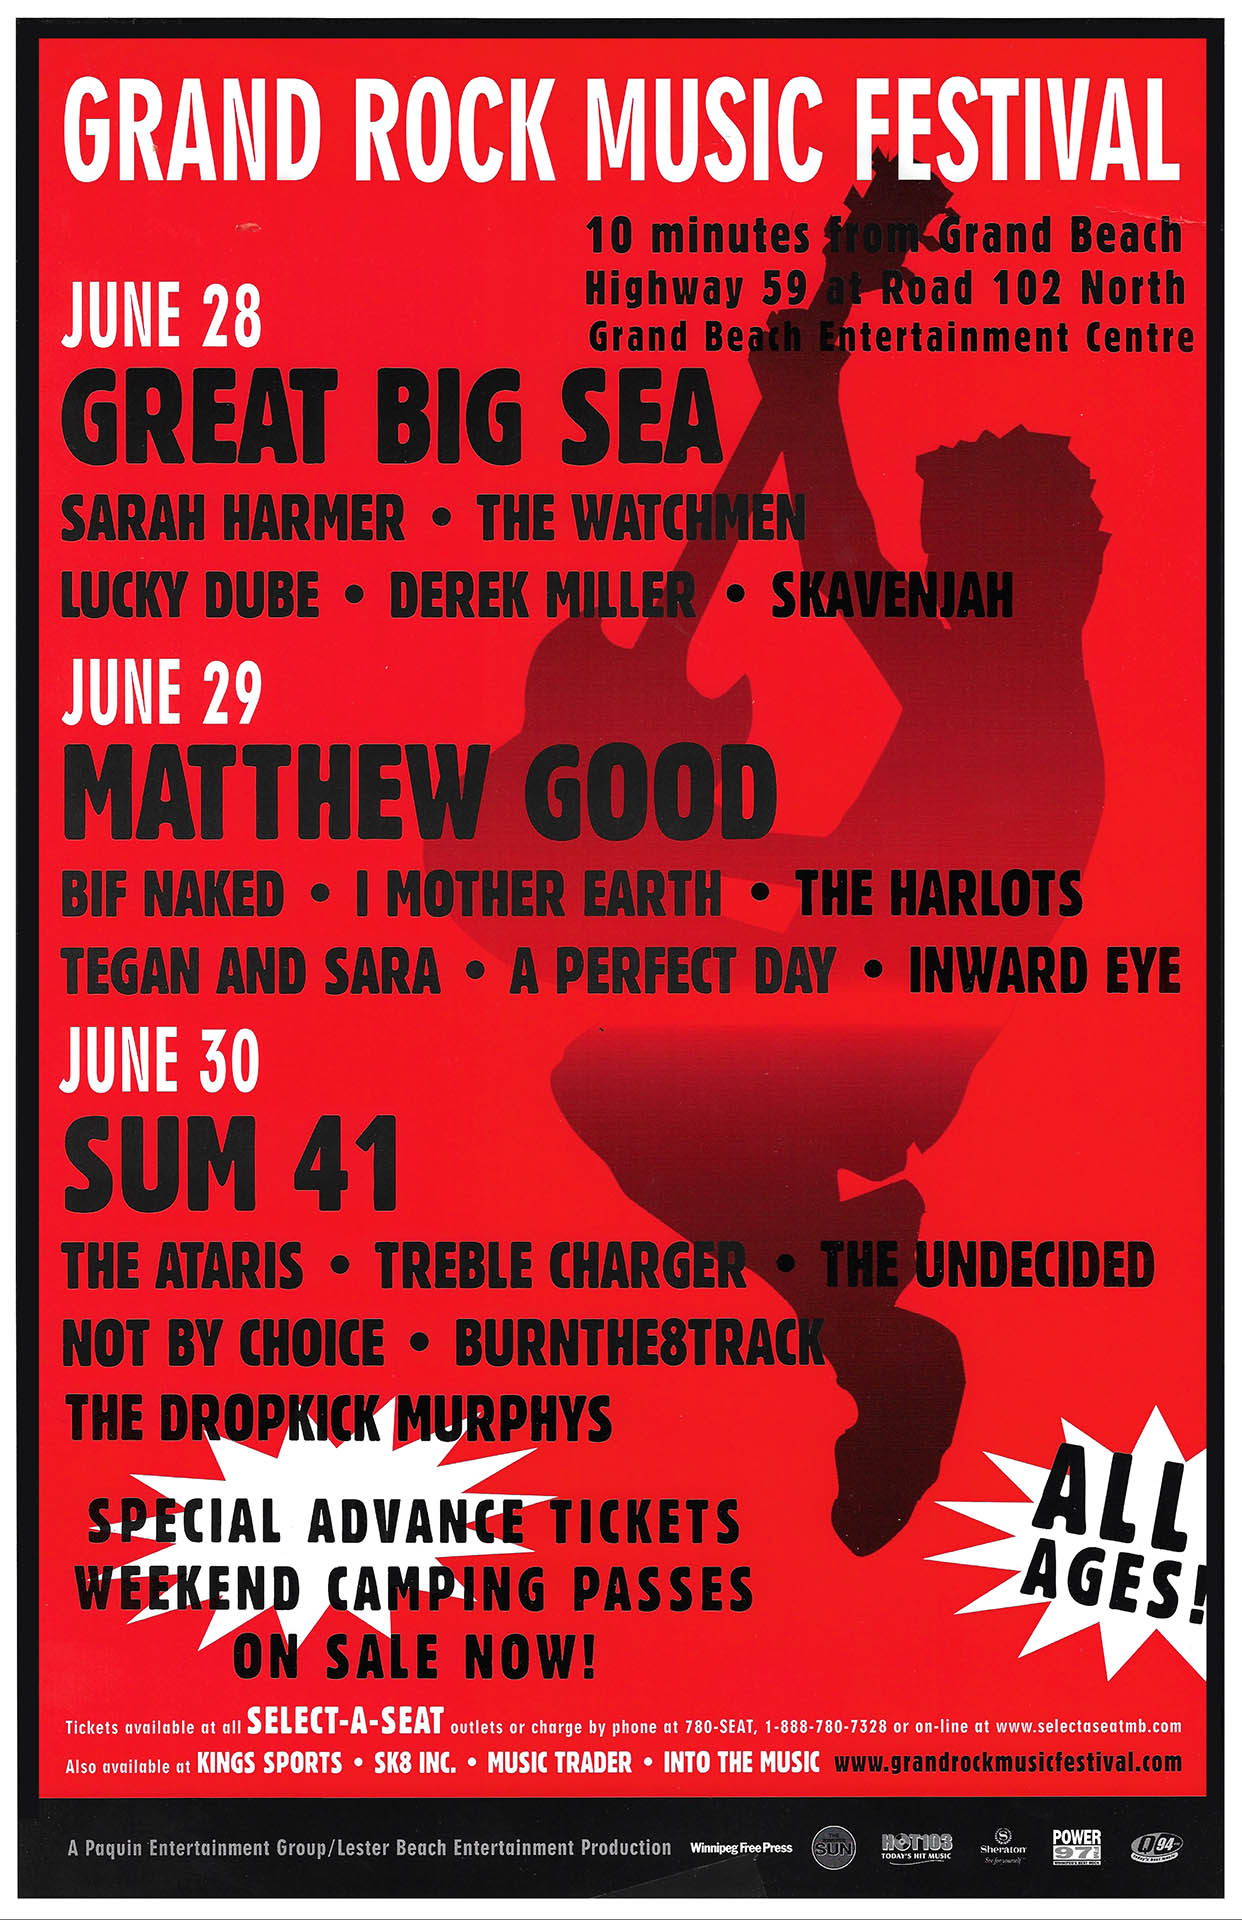 GRAND ROCK MUSIC FESTIVAL – 2002